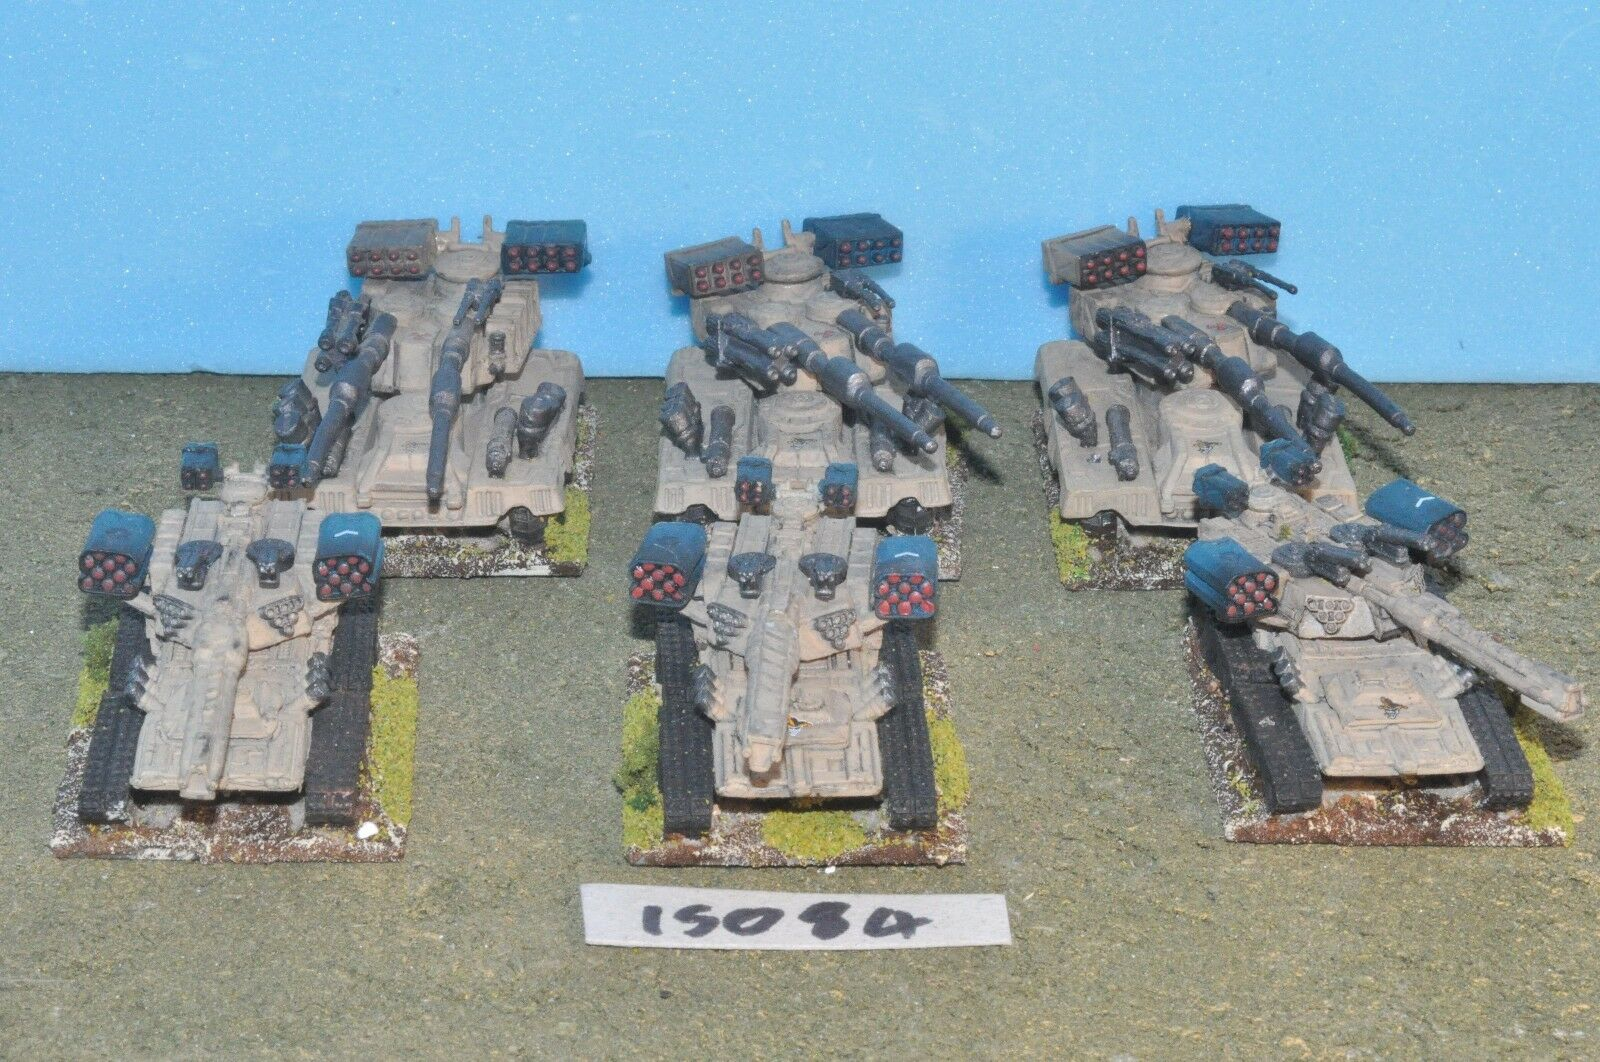 oferta especial MECHWARRIOR Battletech Dropzone Dropzone Dropzone comandante 6 tanques pesados (15084) Fasa RAL PARTHA  connotación de lujo discreta